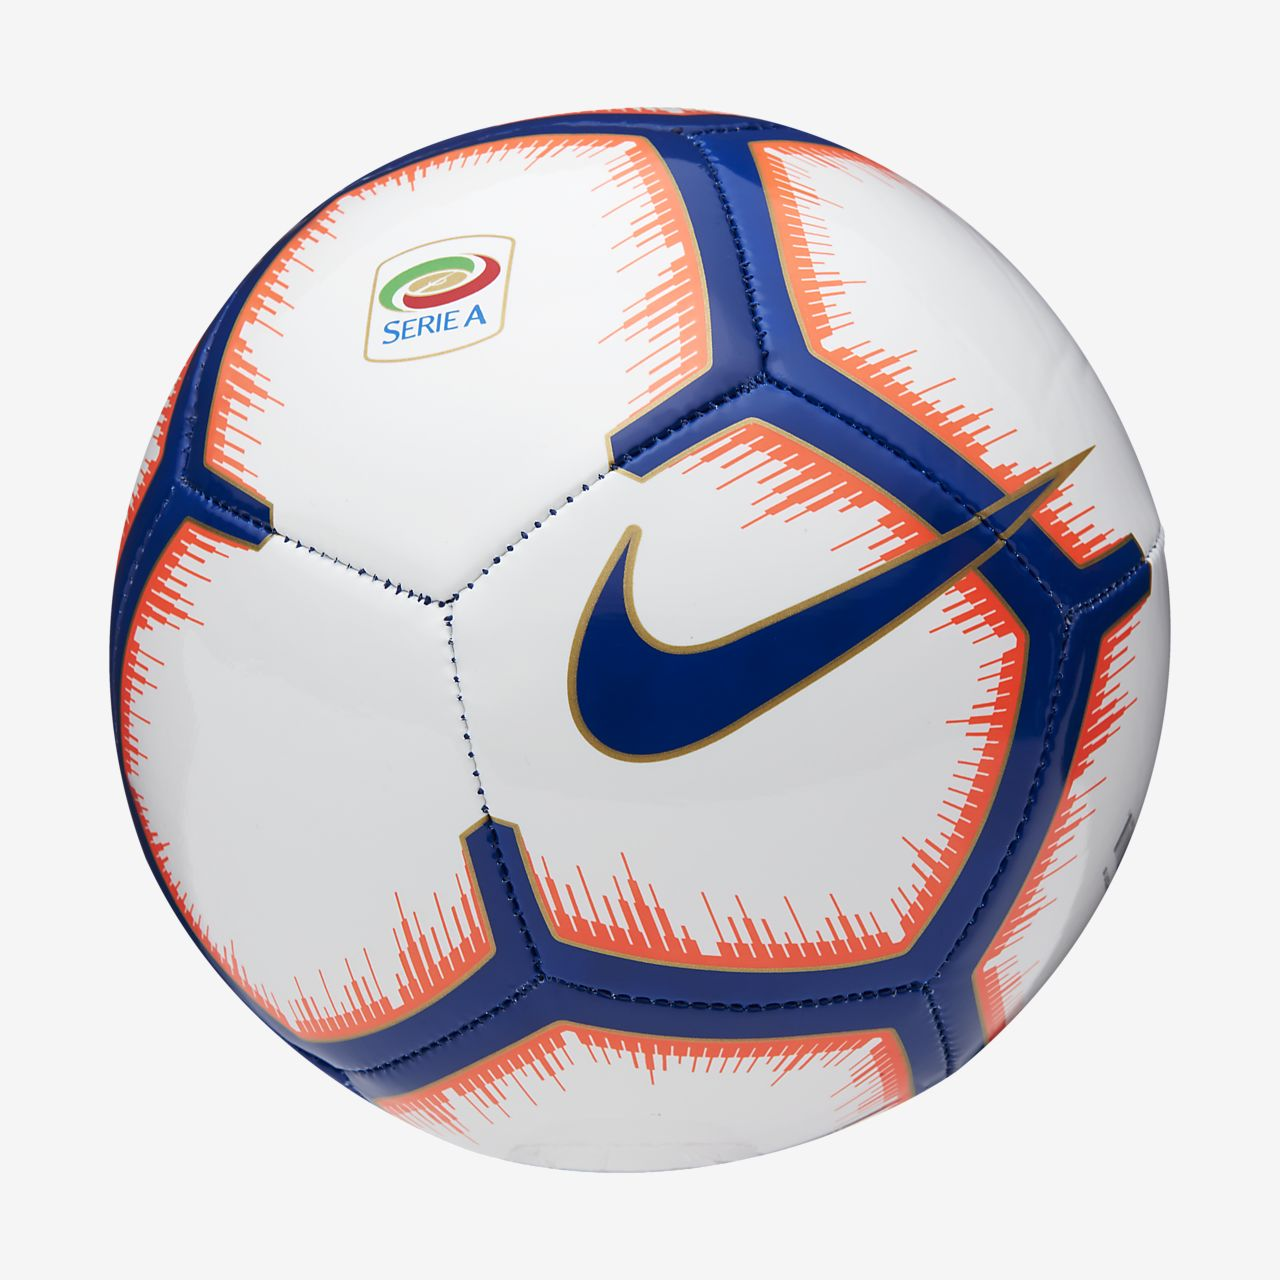 Serie A Skills fotball